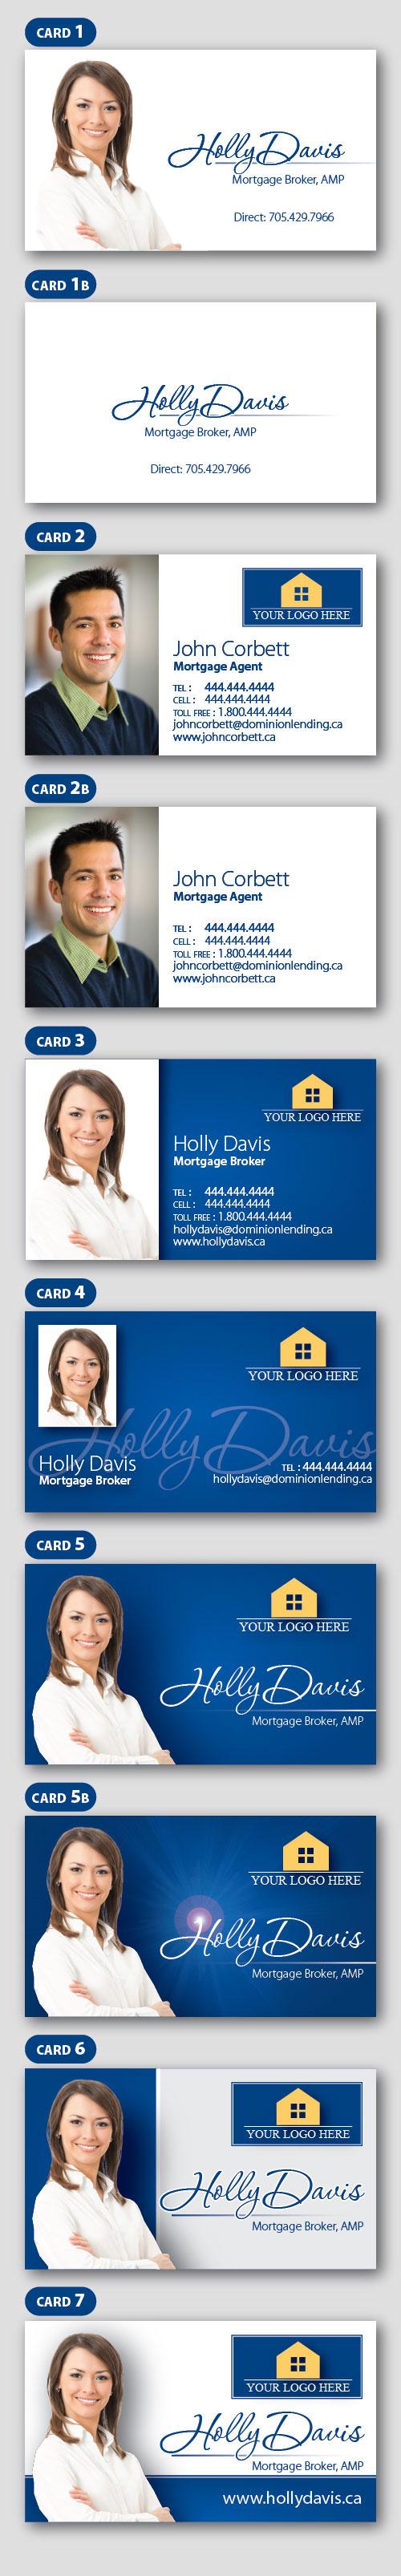 Charisma Business Card